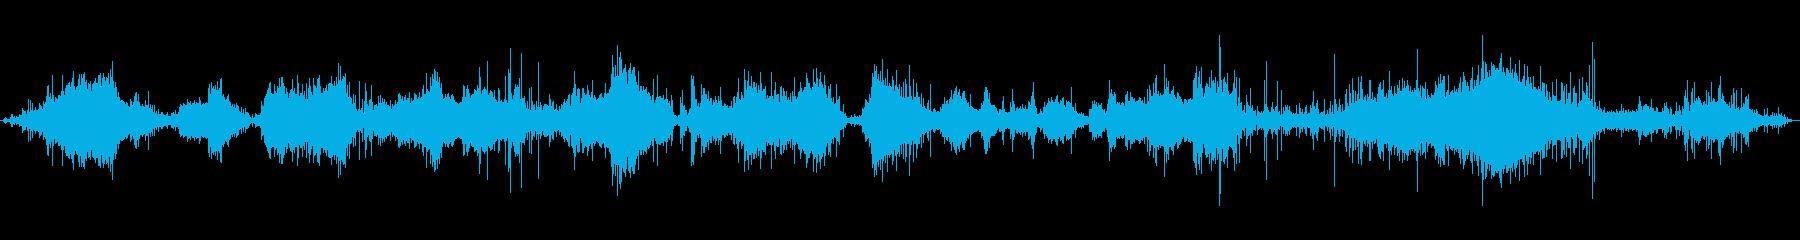 RAIN STICK:VARIOU...の再生済みの波形